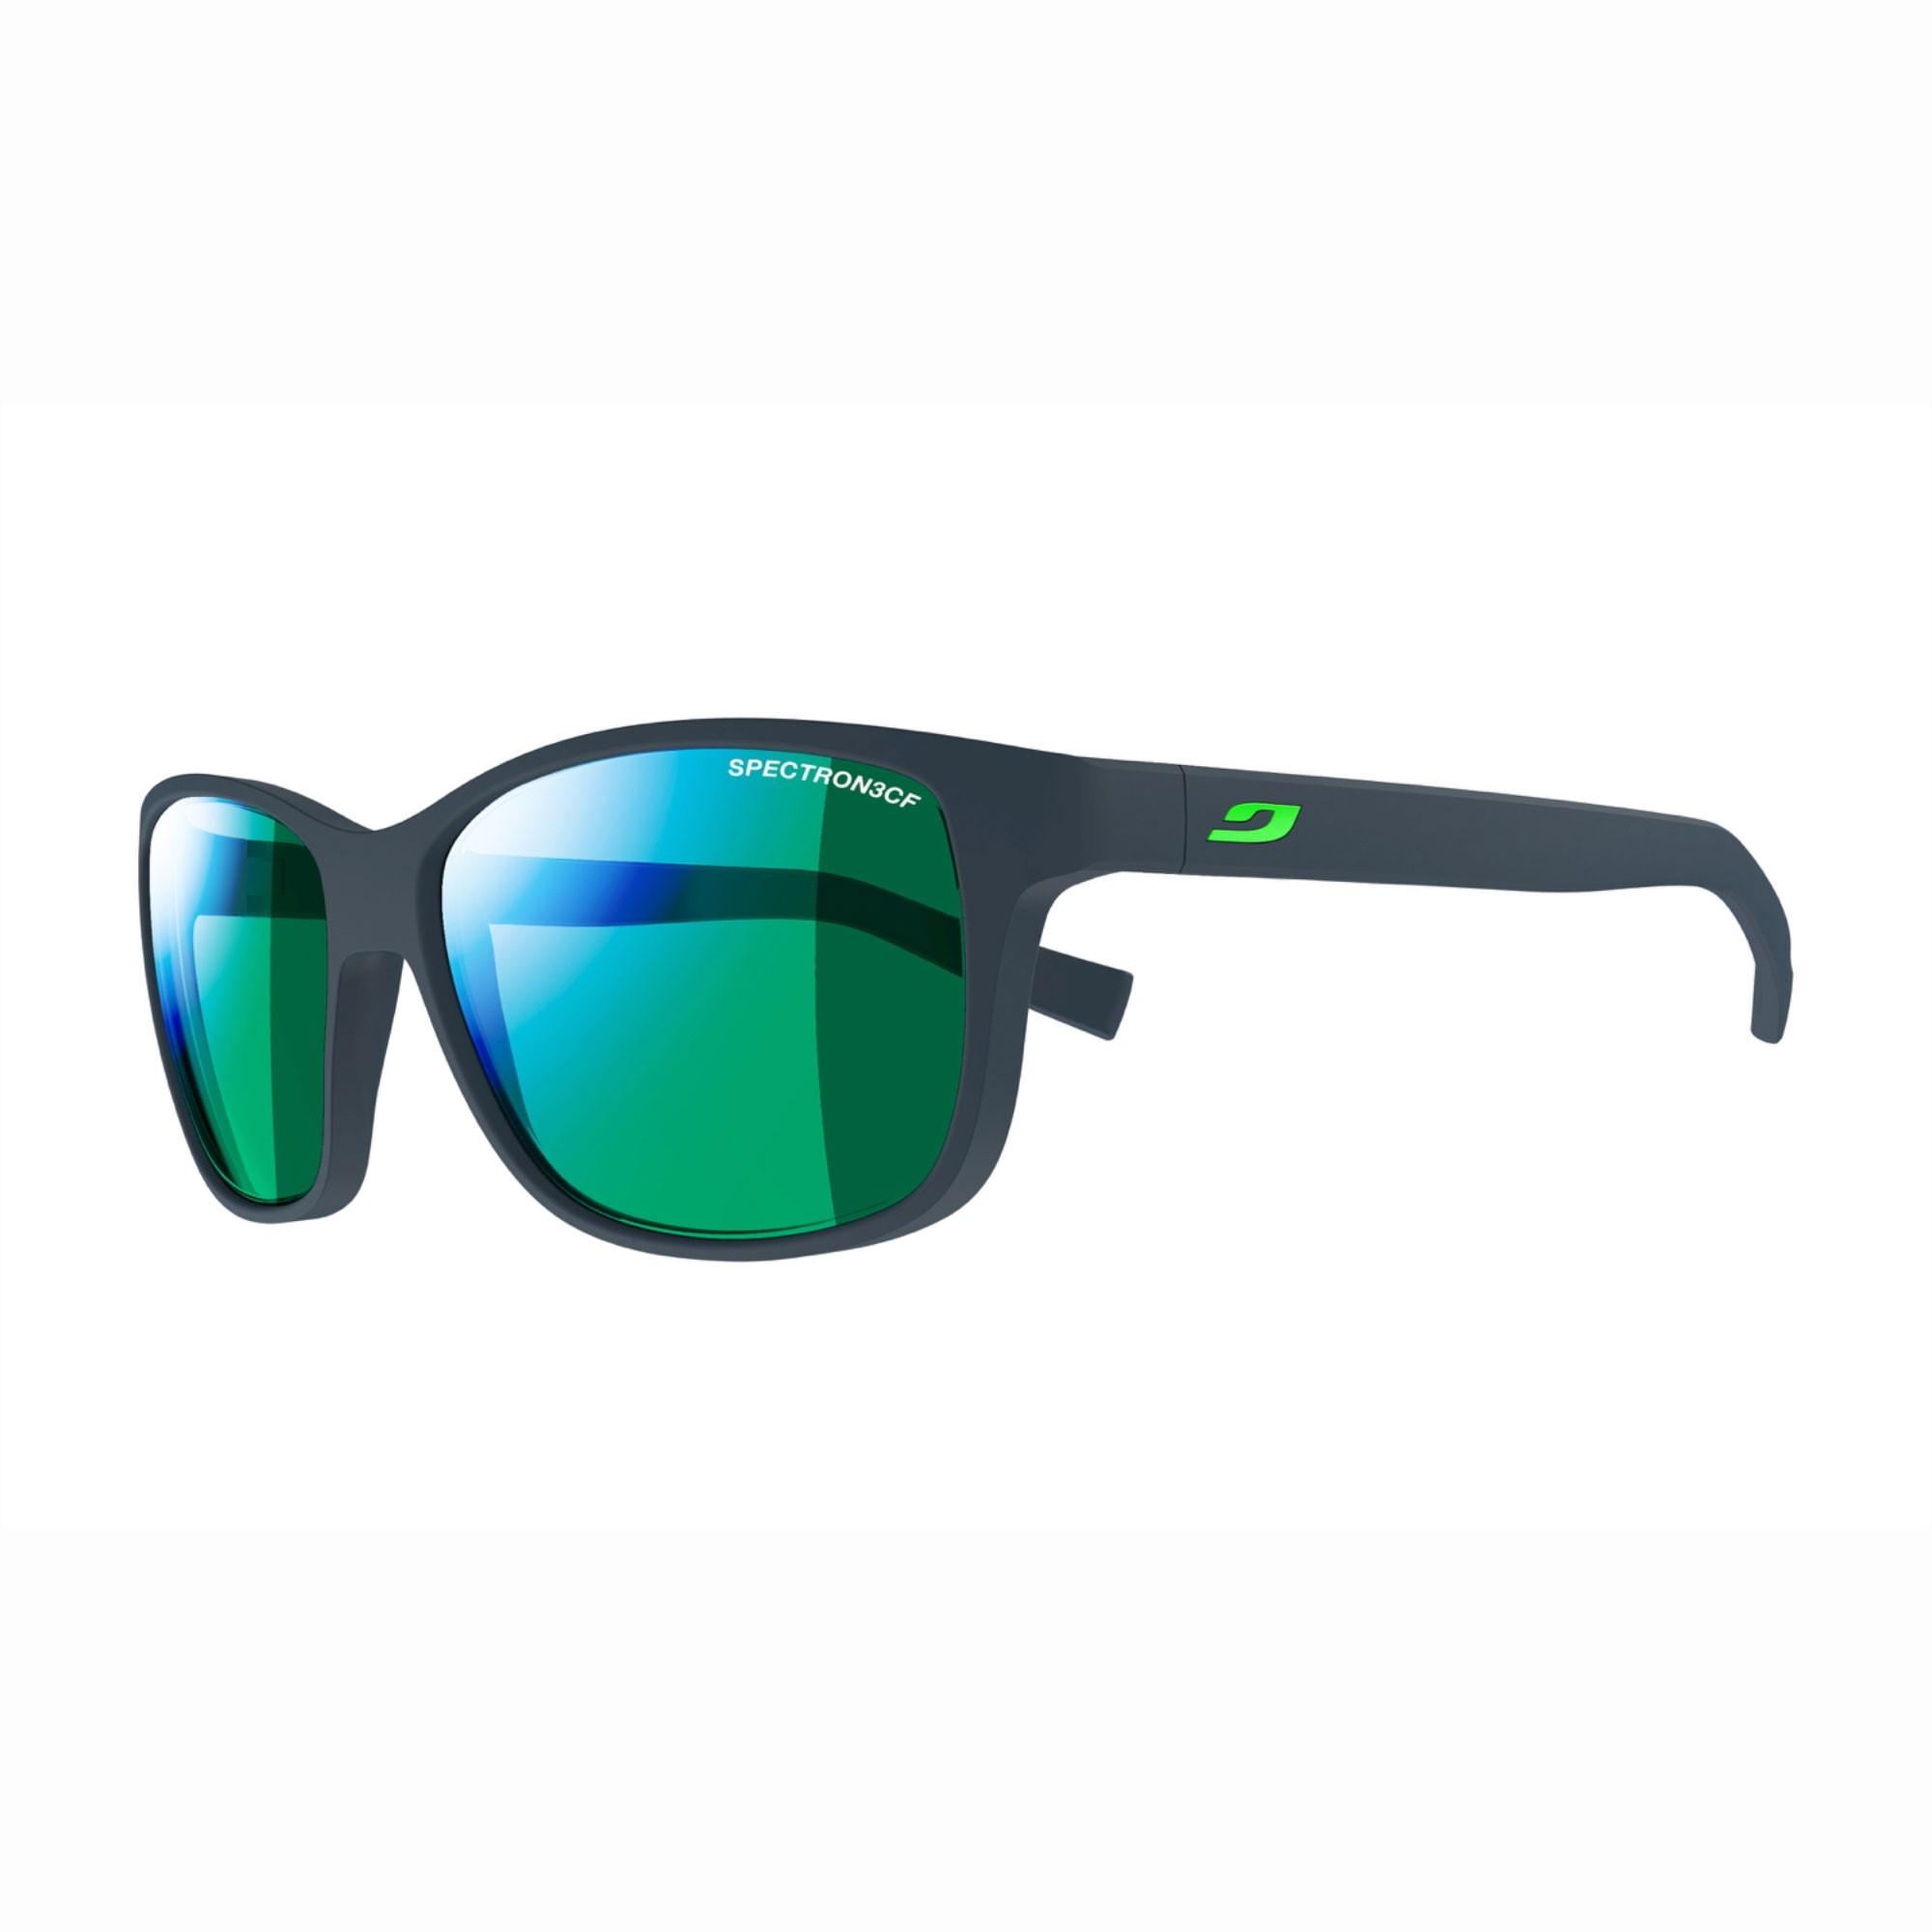 Julbo Powell Sunglasses - Blue/Green - Spectron 3CF